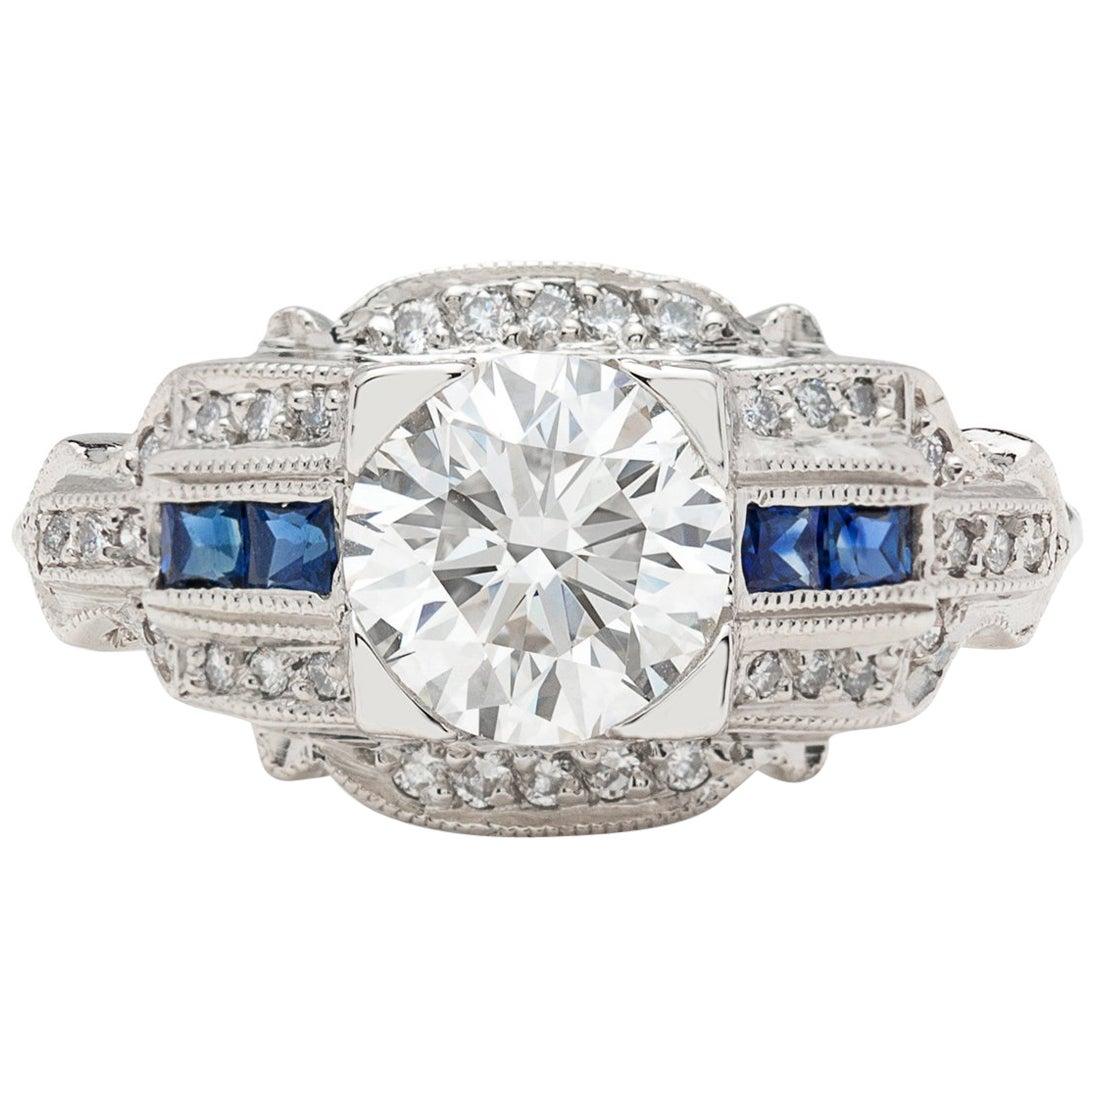 GIA 1.26 carat G/VVS2 Diamond & Sapphire Engagement Ring